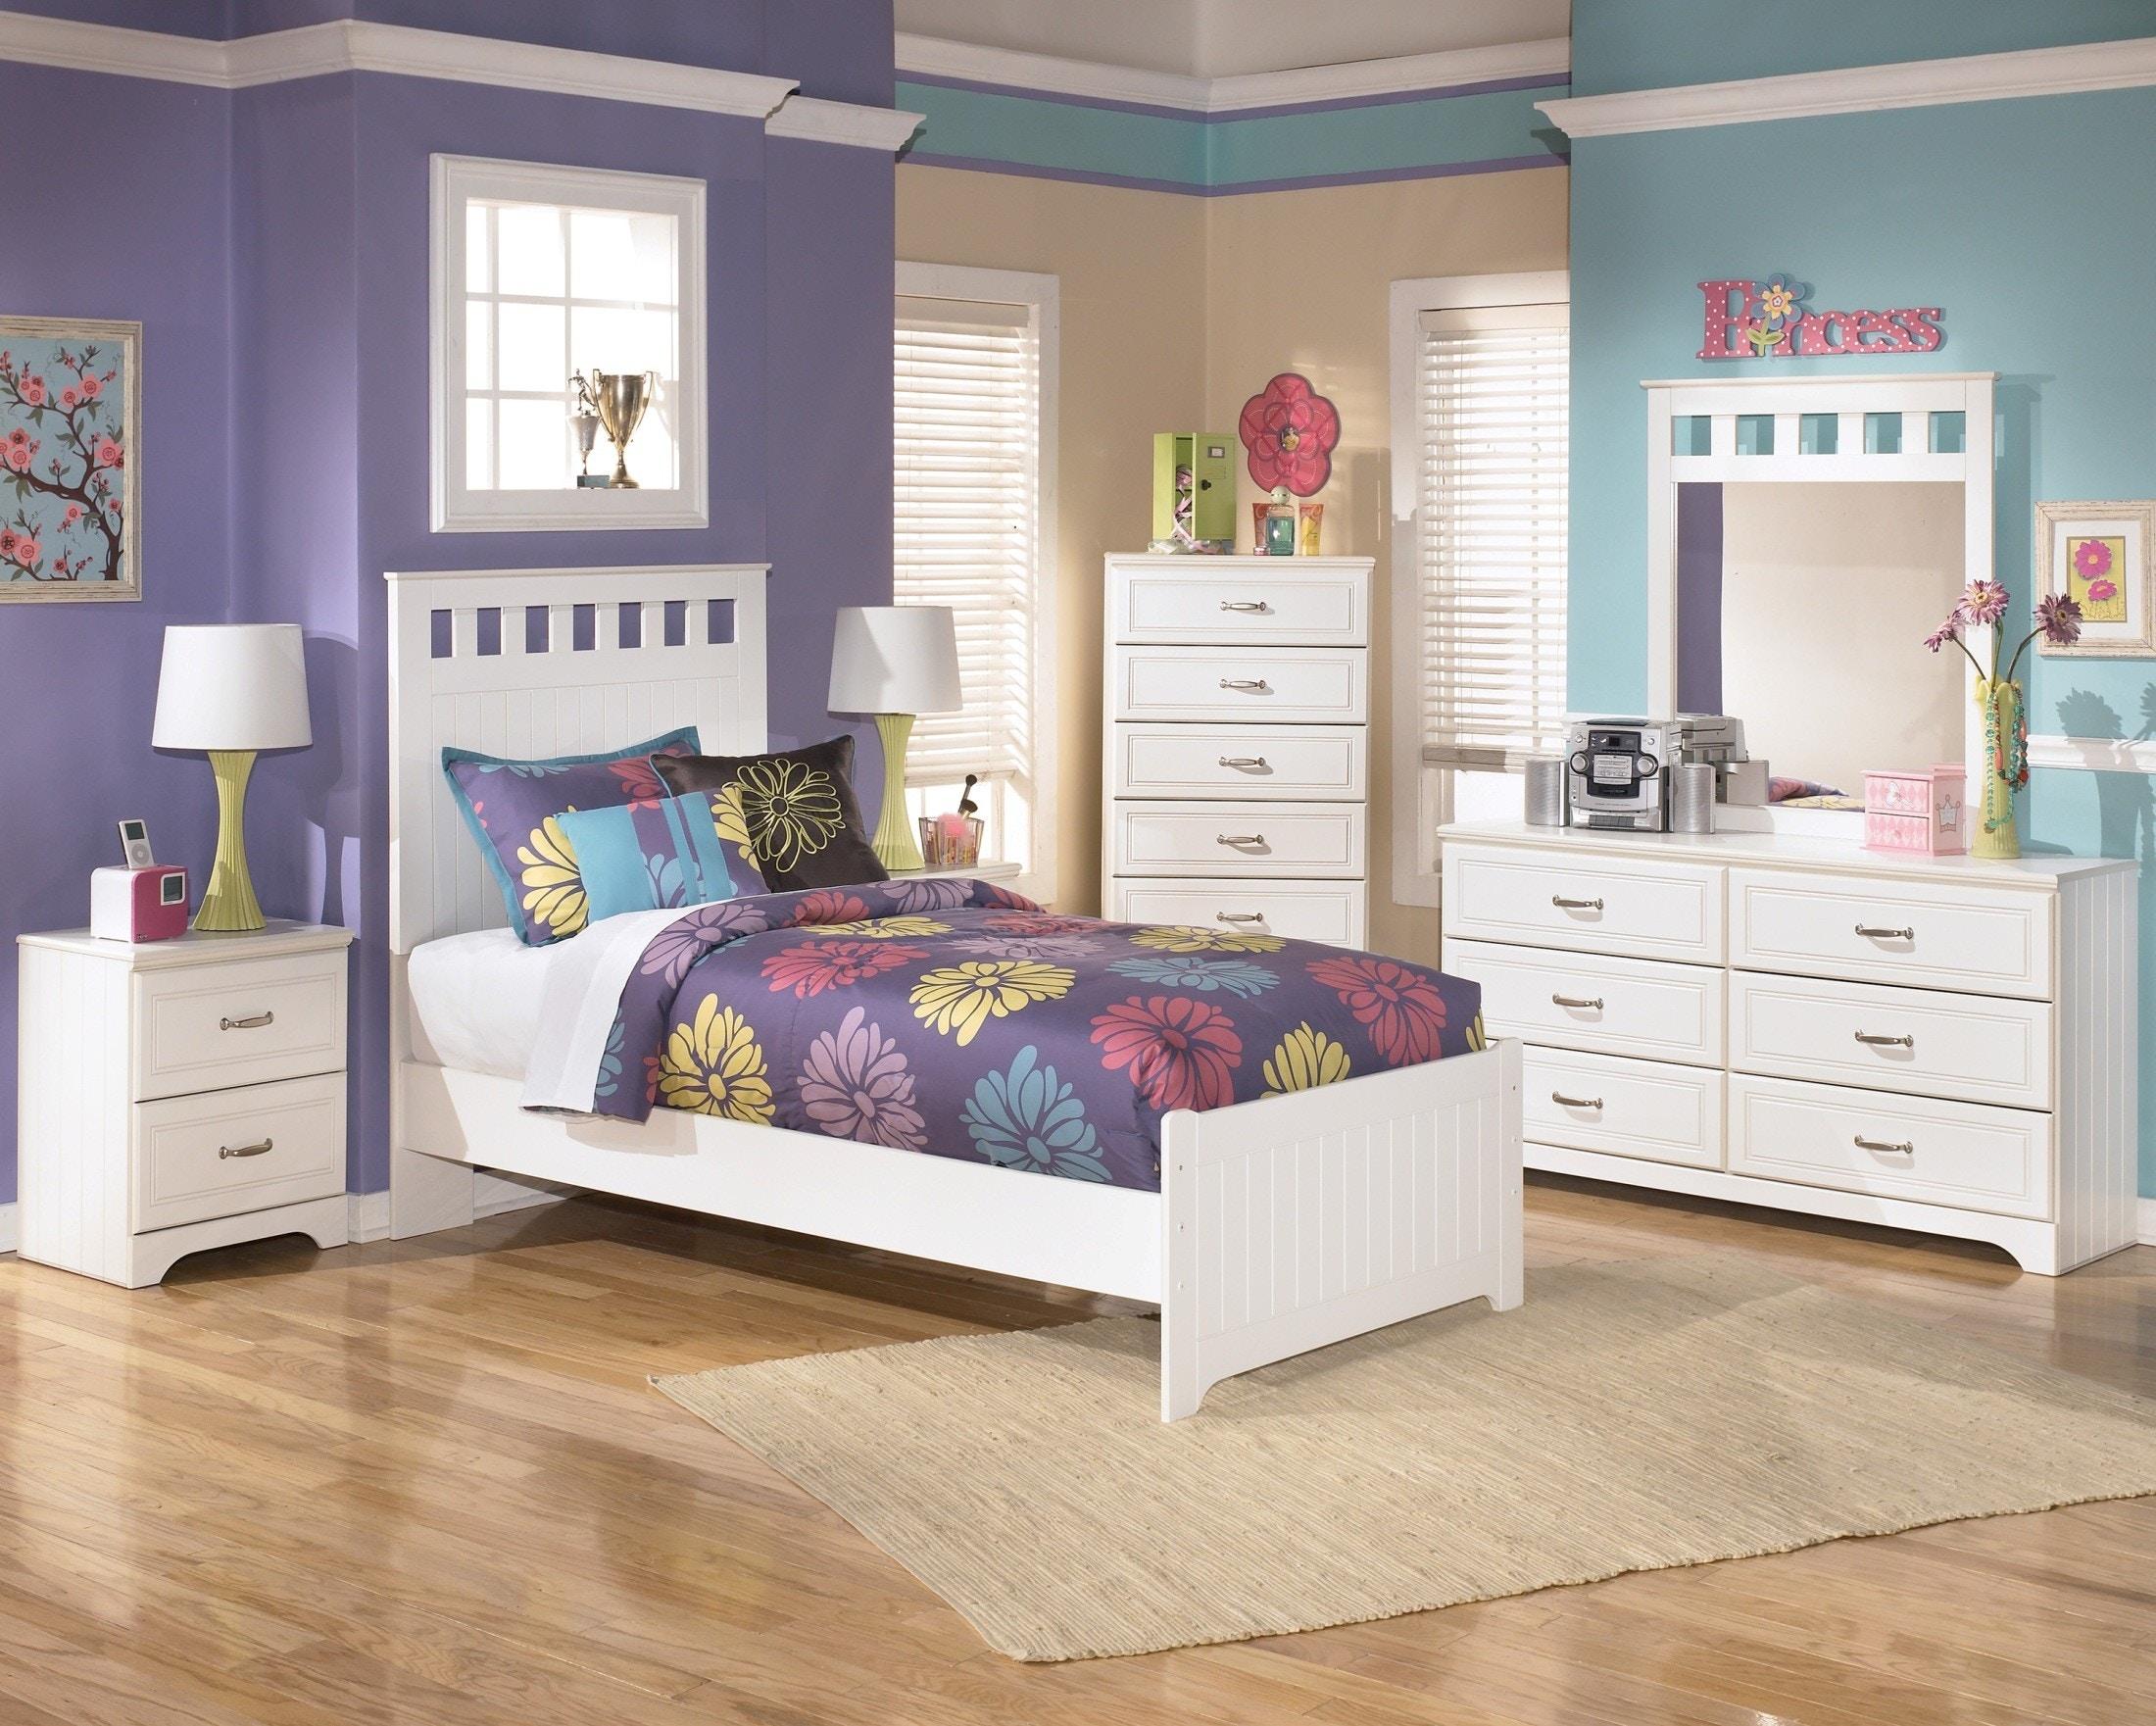 Bedroom Sets With Mirror Headboard lulu 5pc bedroom set: headboard, footboard, rails, dresser, and mirror